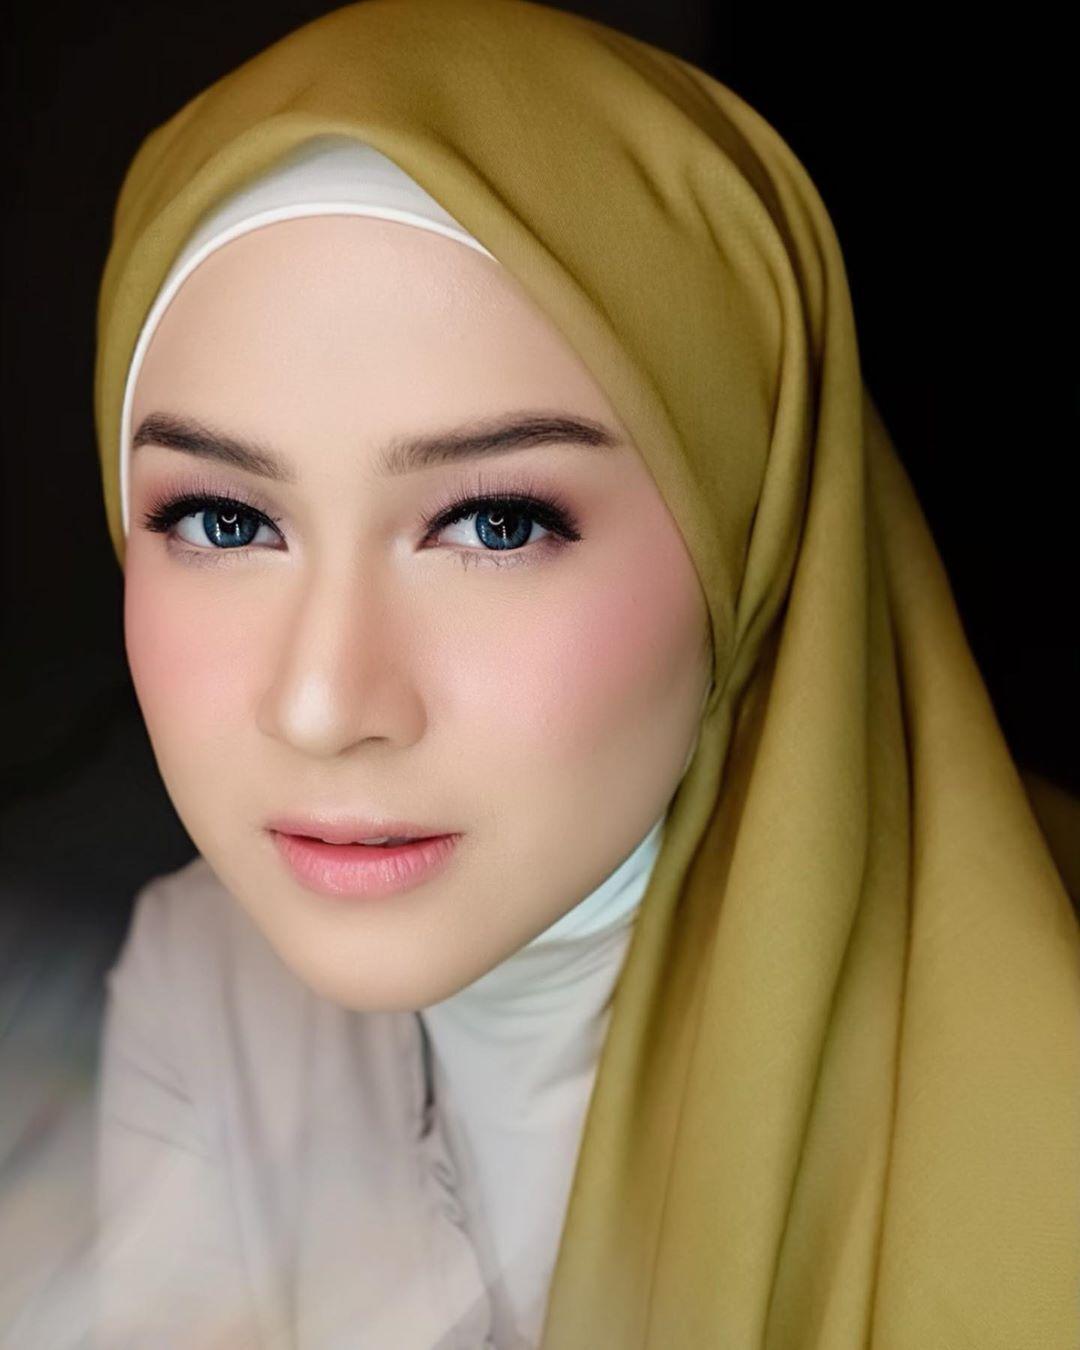 Gambar Mungkin Berisi 1 Orang Dekat Artis Hijab